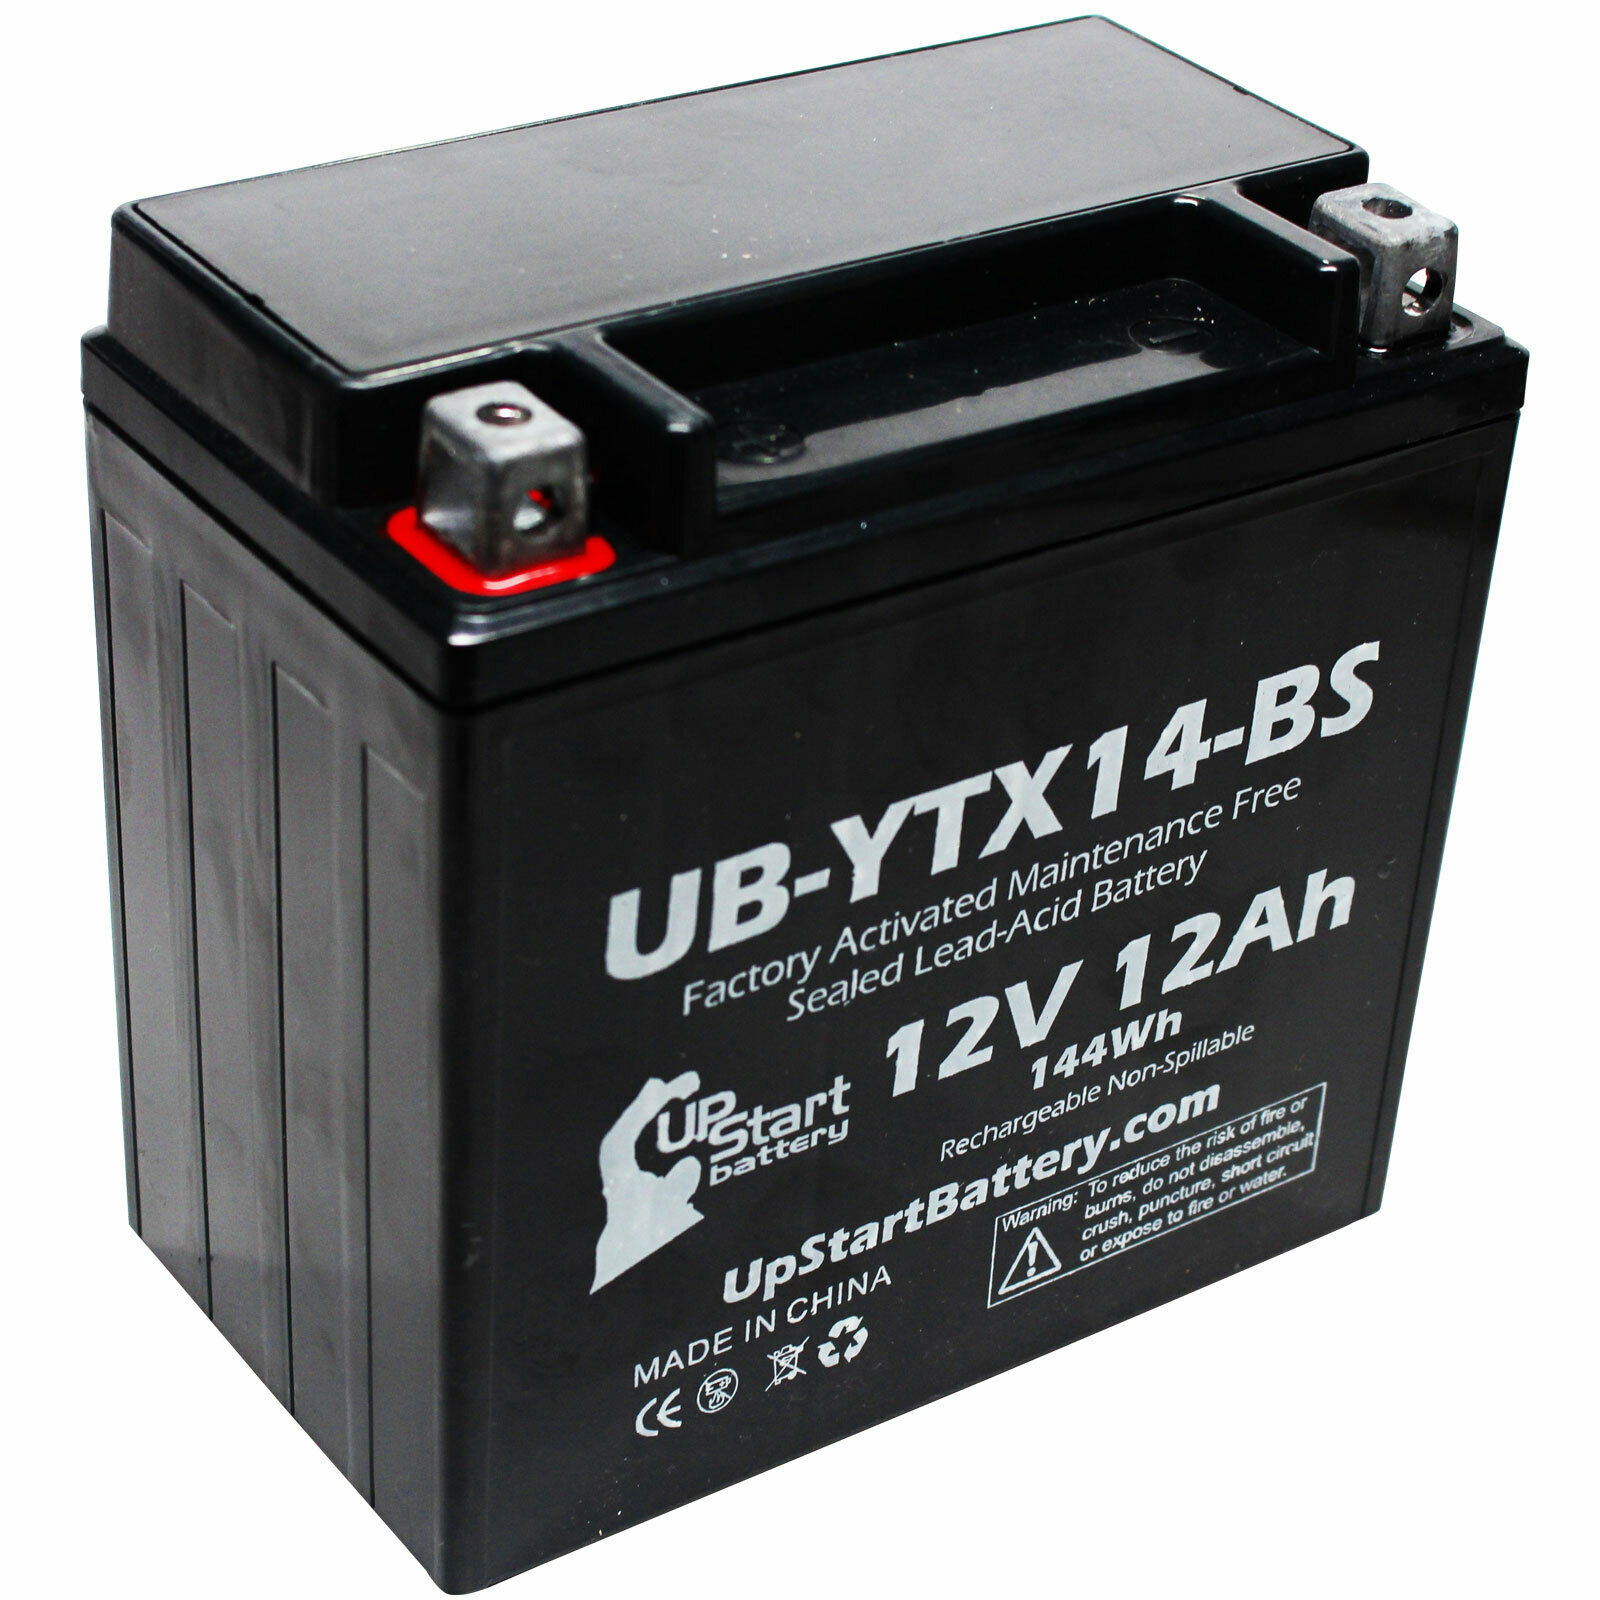 12V 12AH Battery for 1988 Honda TRX300 Fourtrax 300 CC